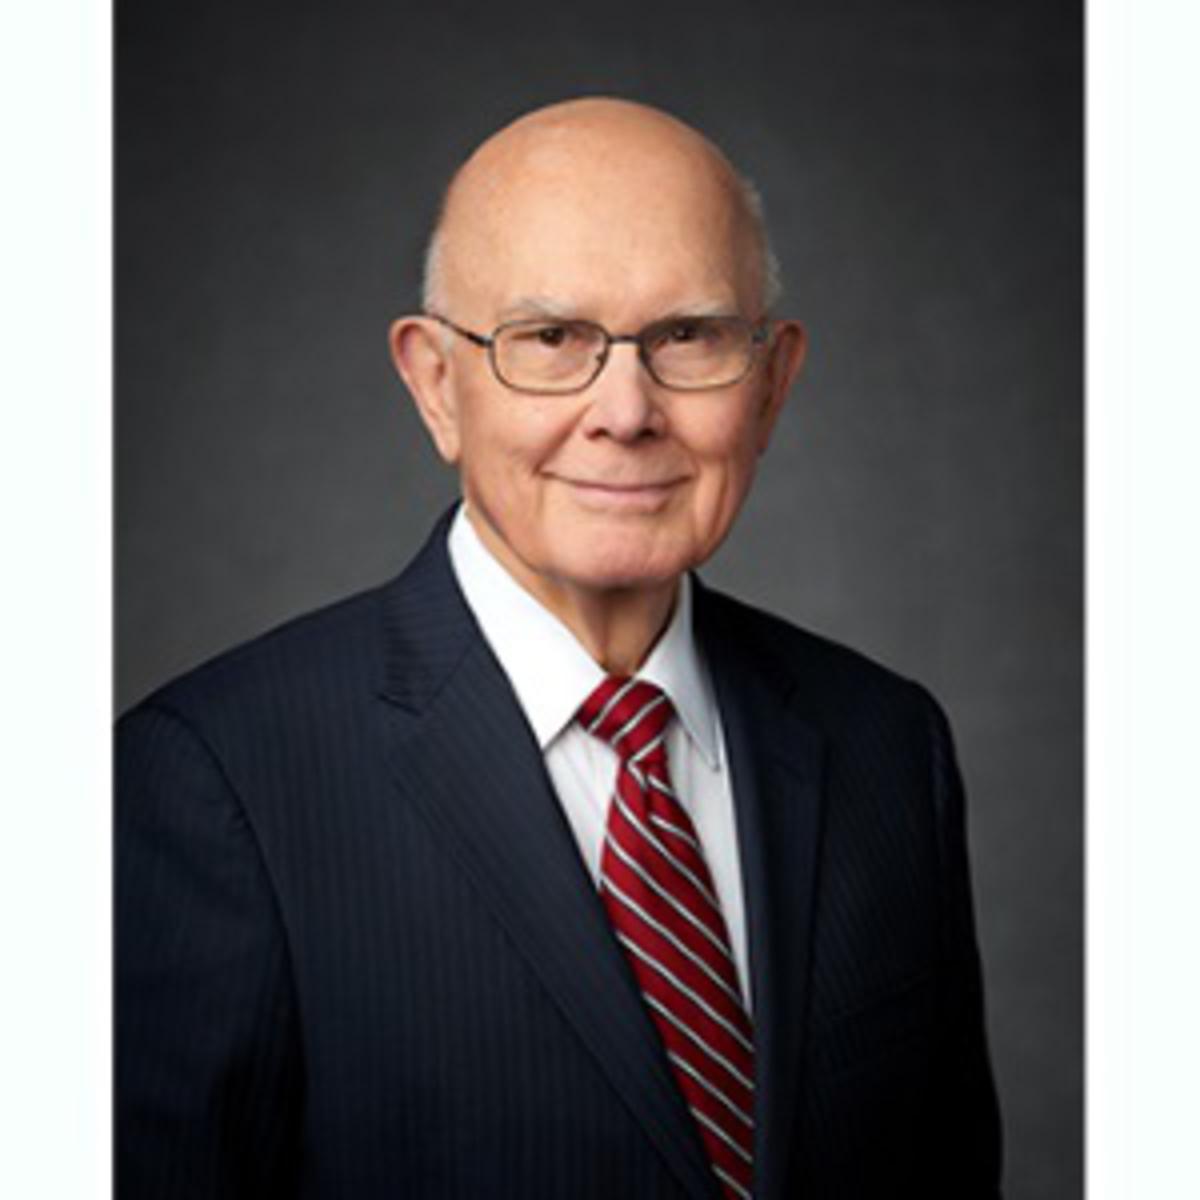 President Dallin H. Oaks